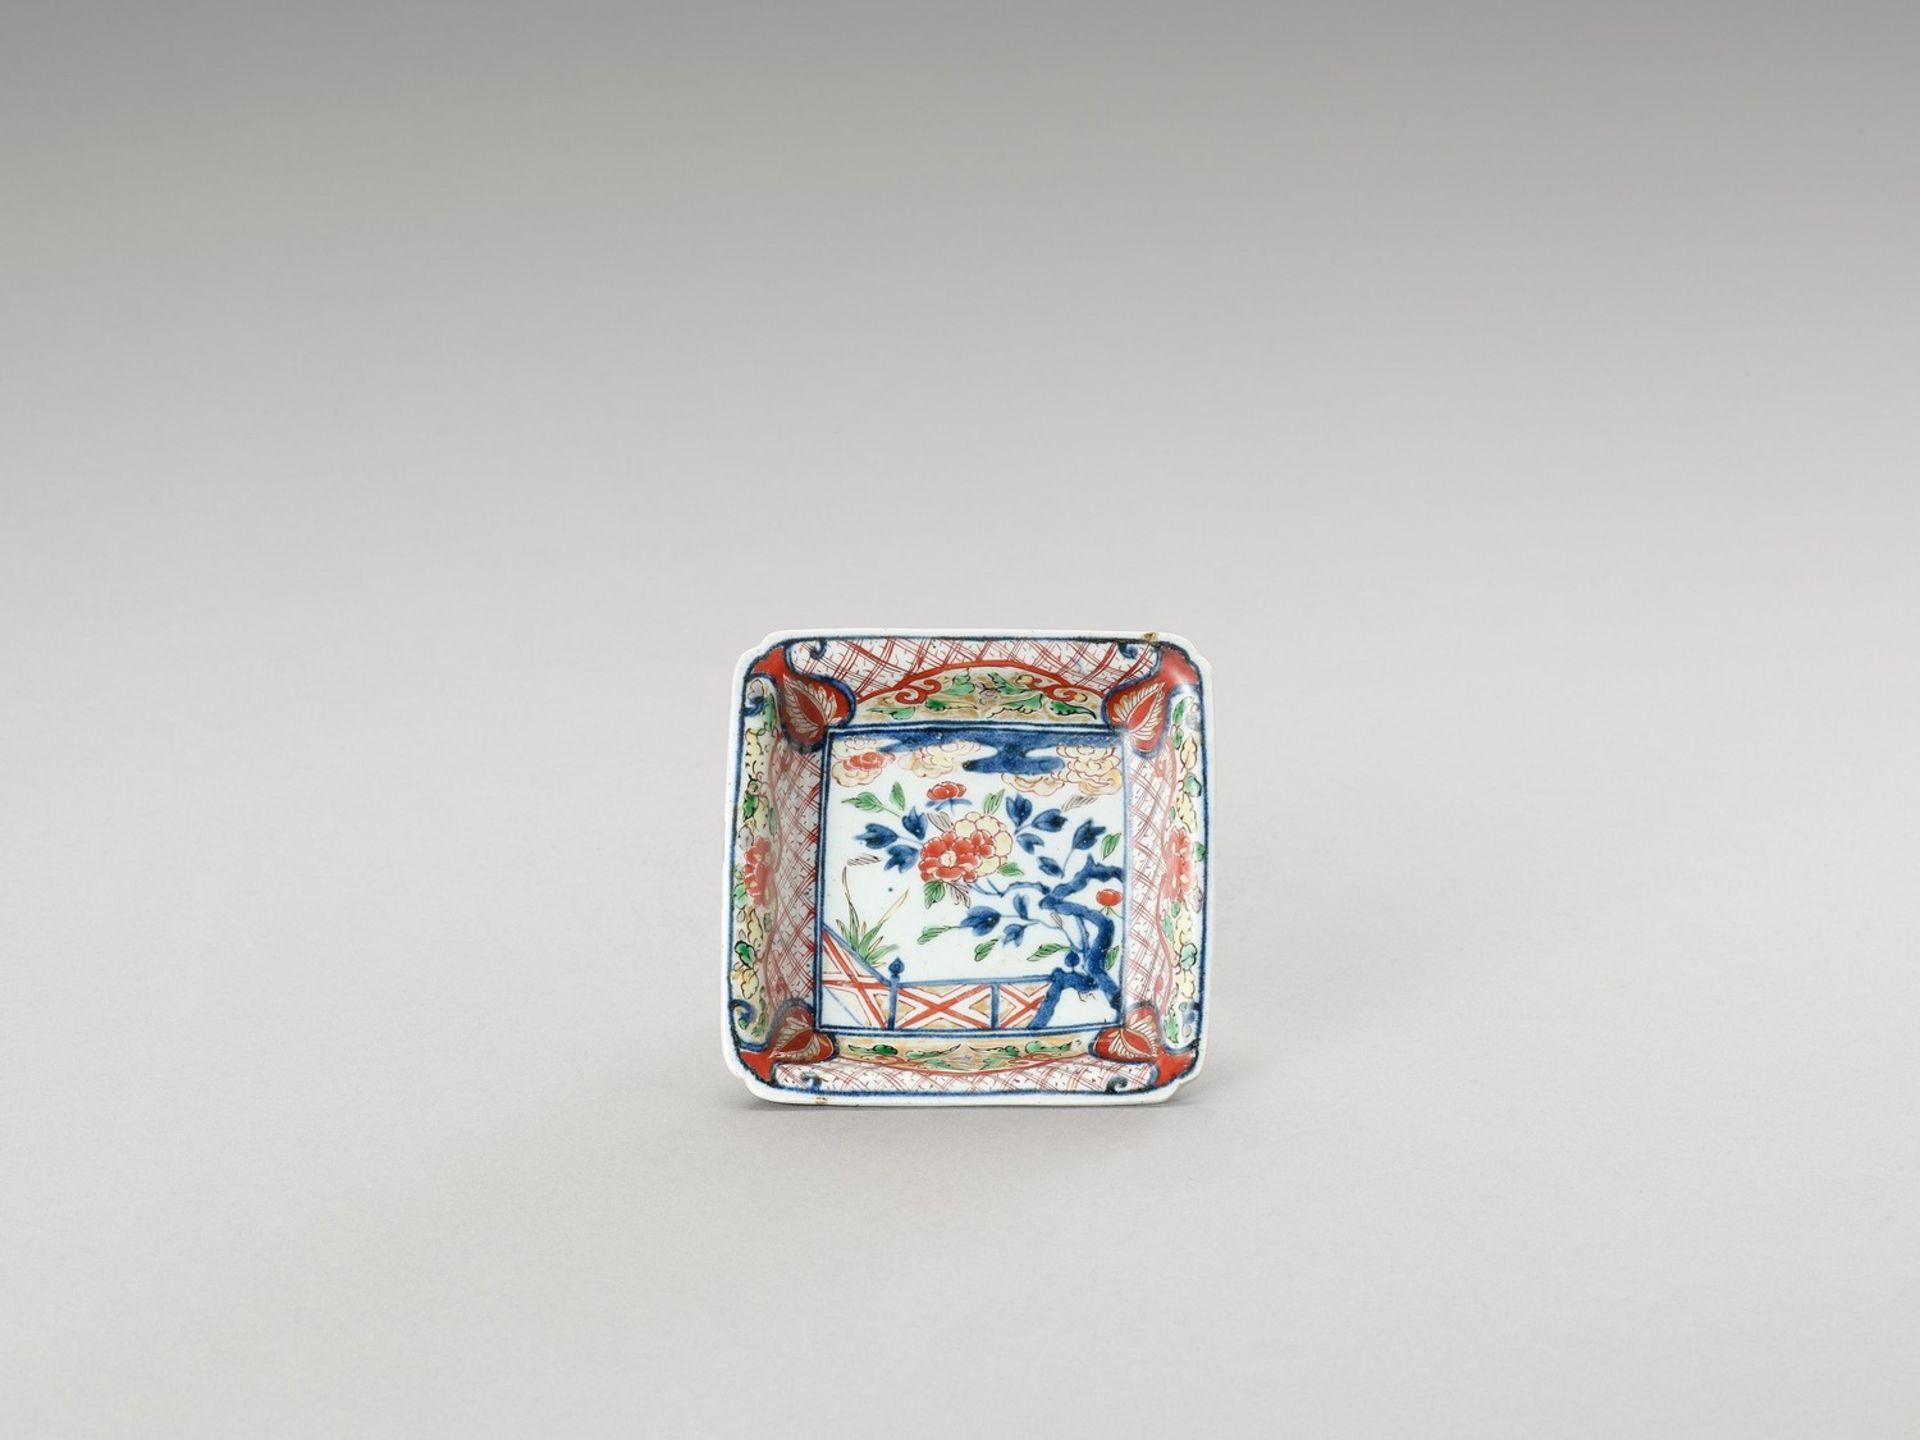 A SMALL SQUARE IMARI PORCELAIN DISH - Image 2 of 4